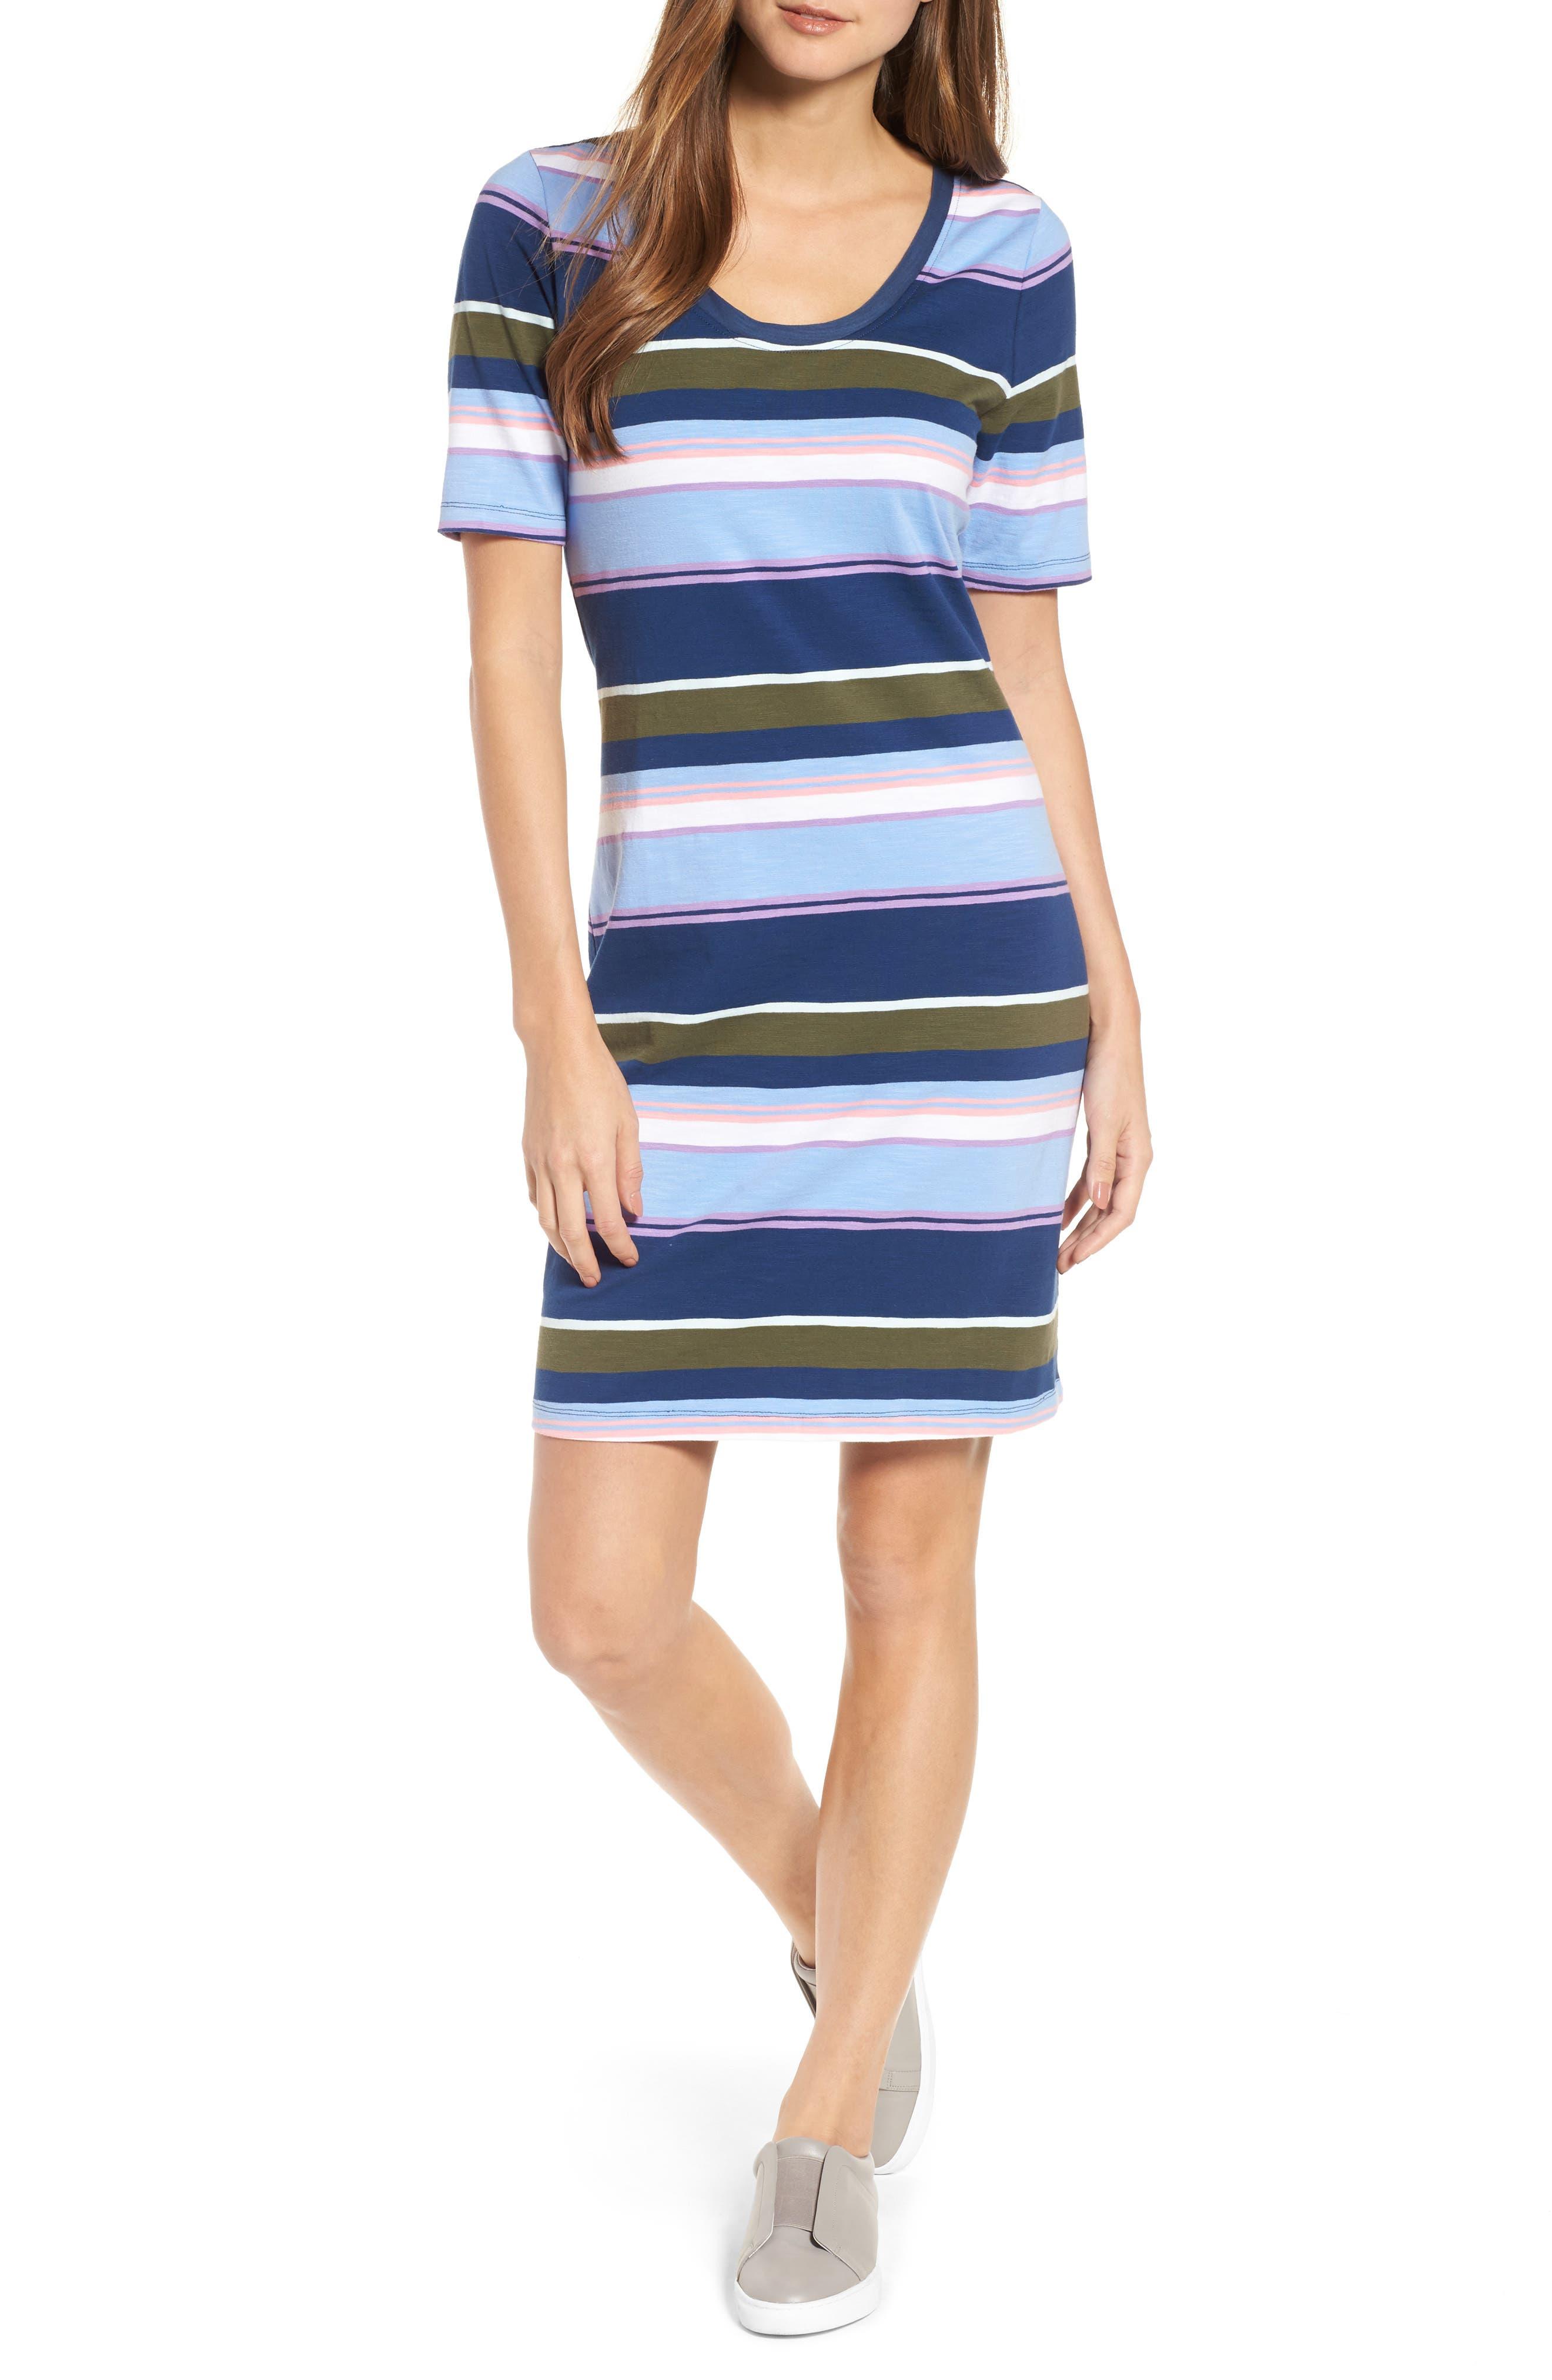 Main Image - Tommy Bahama Stripe Scoop Neck Dress